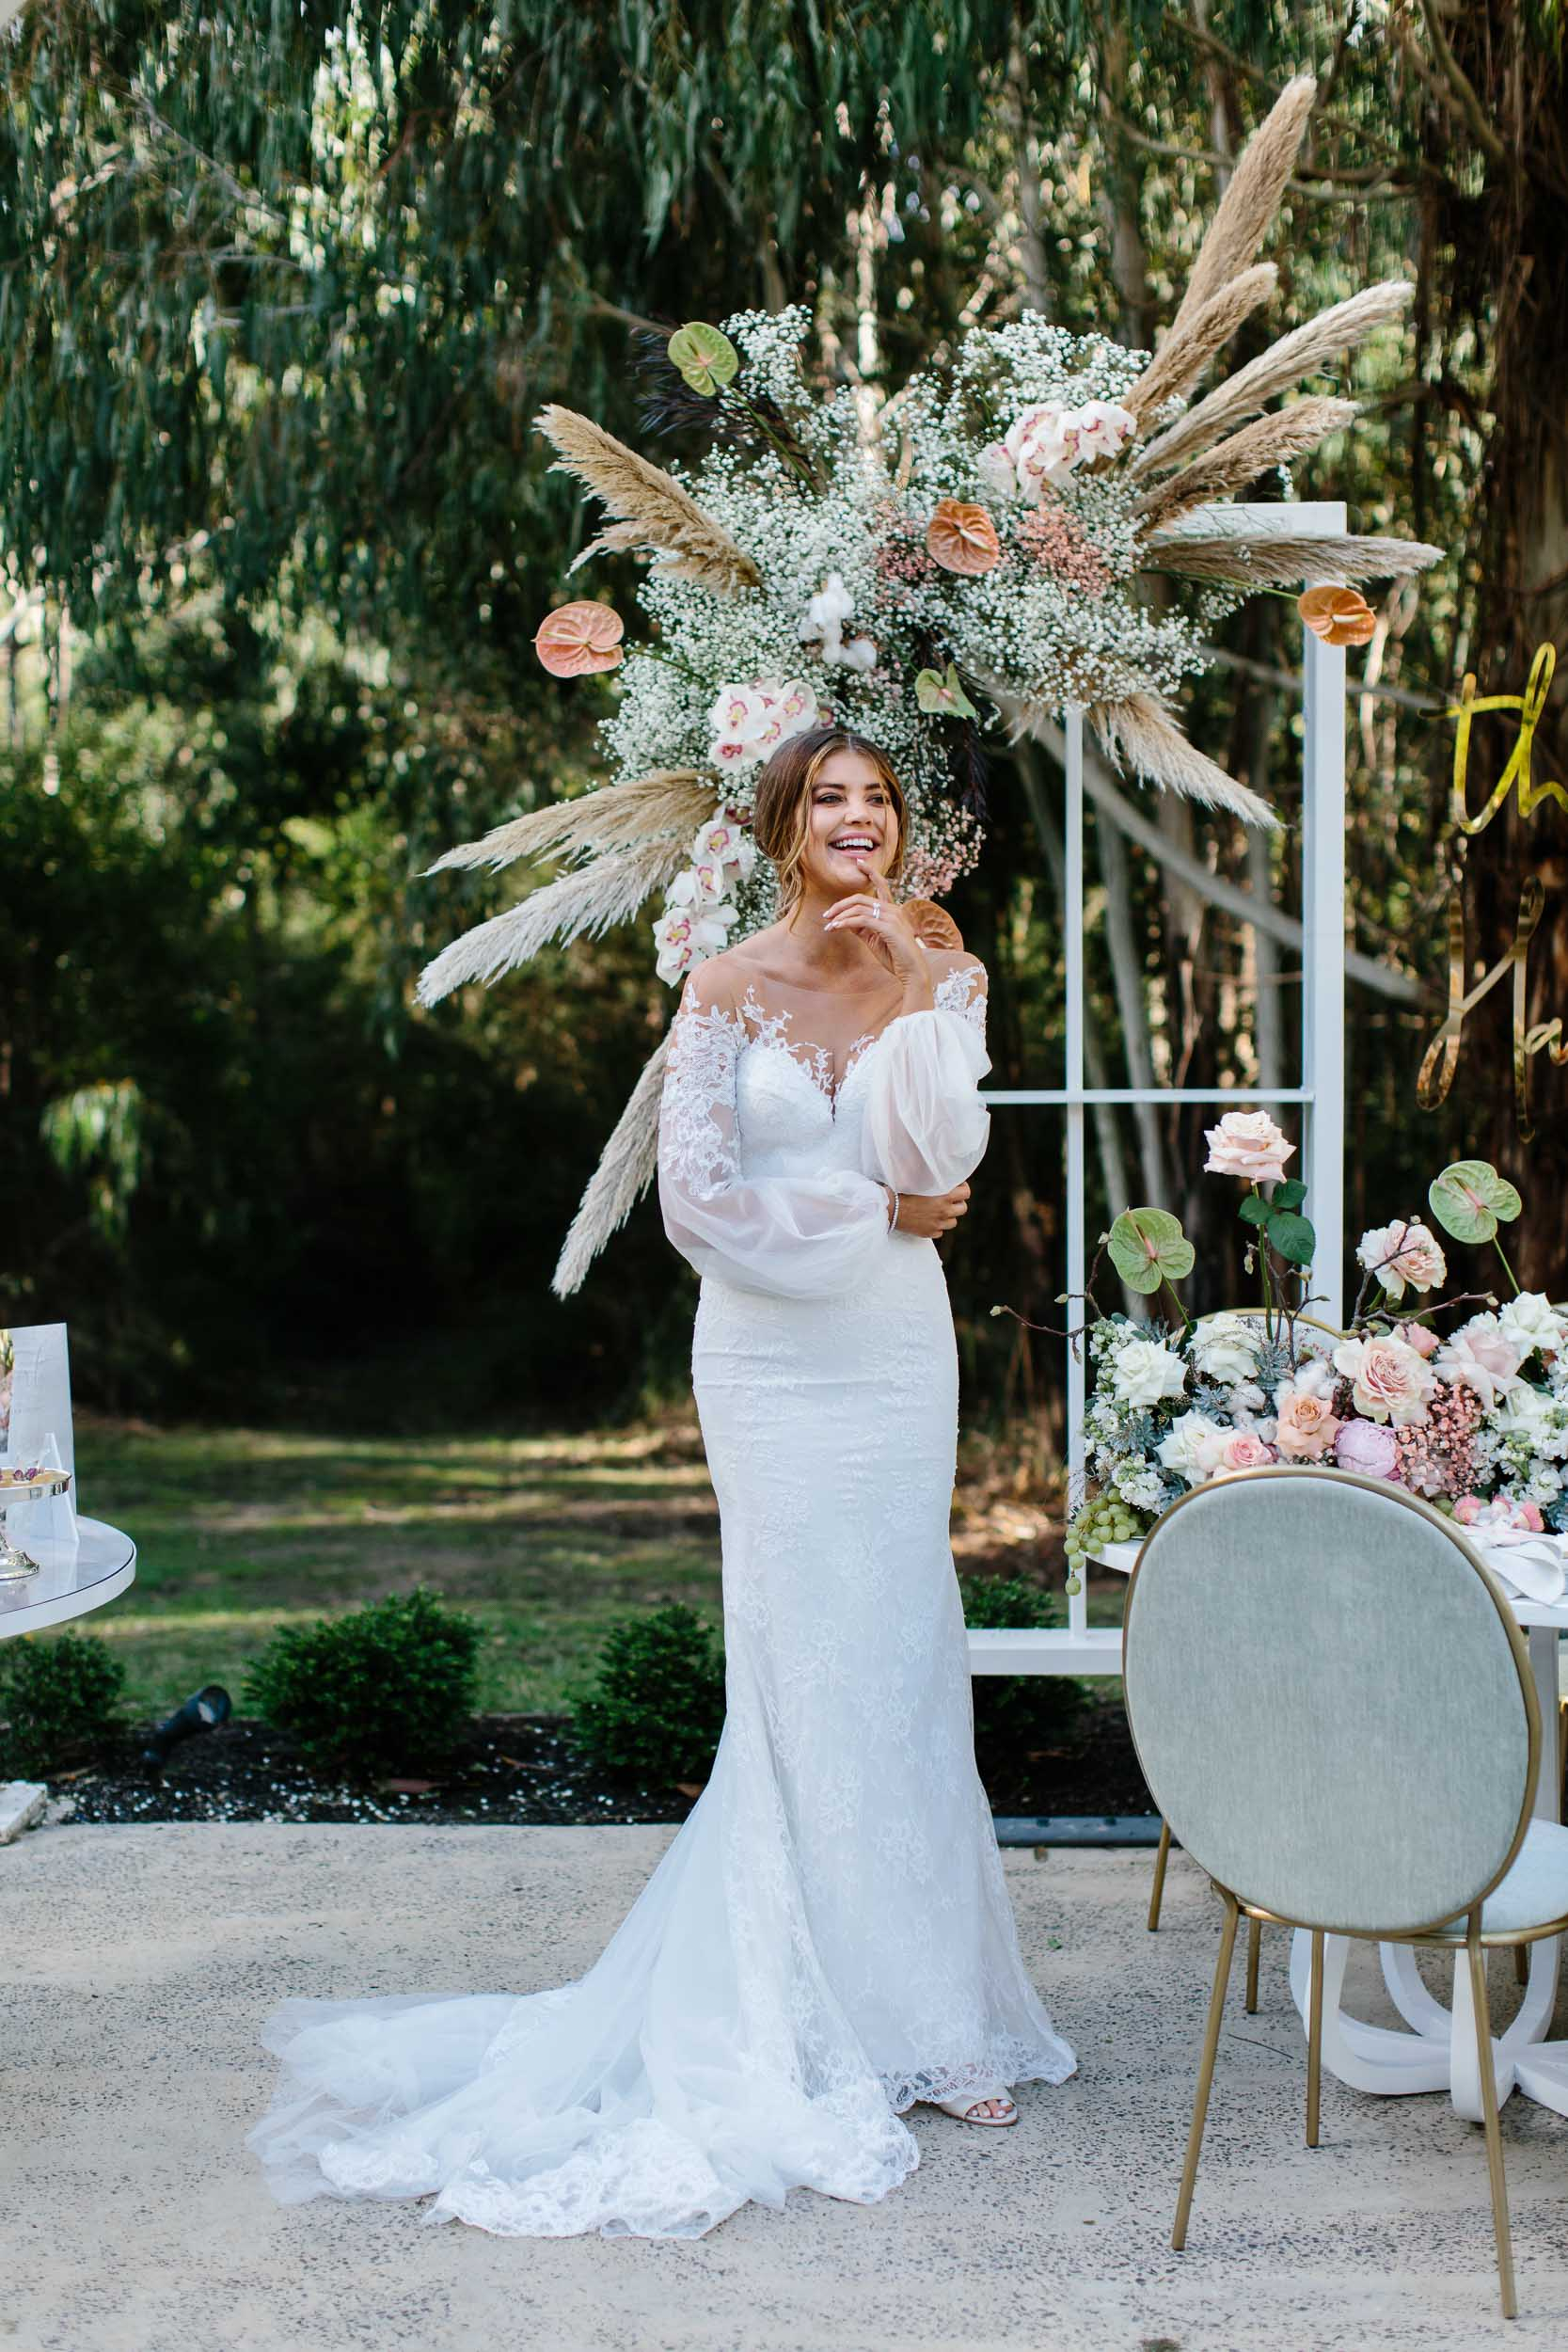 Kas-Richards-LENZO-Yarra-Valley-Wedding-One-Day-Bridal-176.jpg